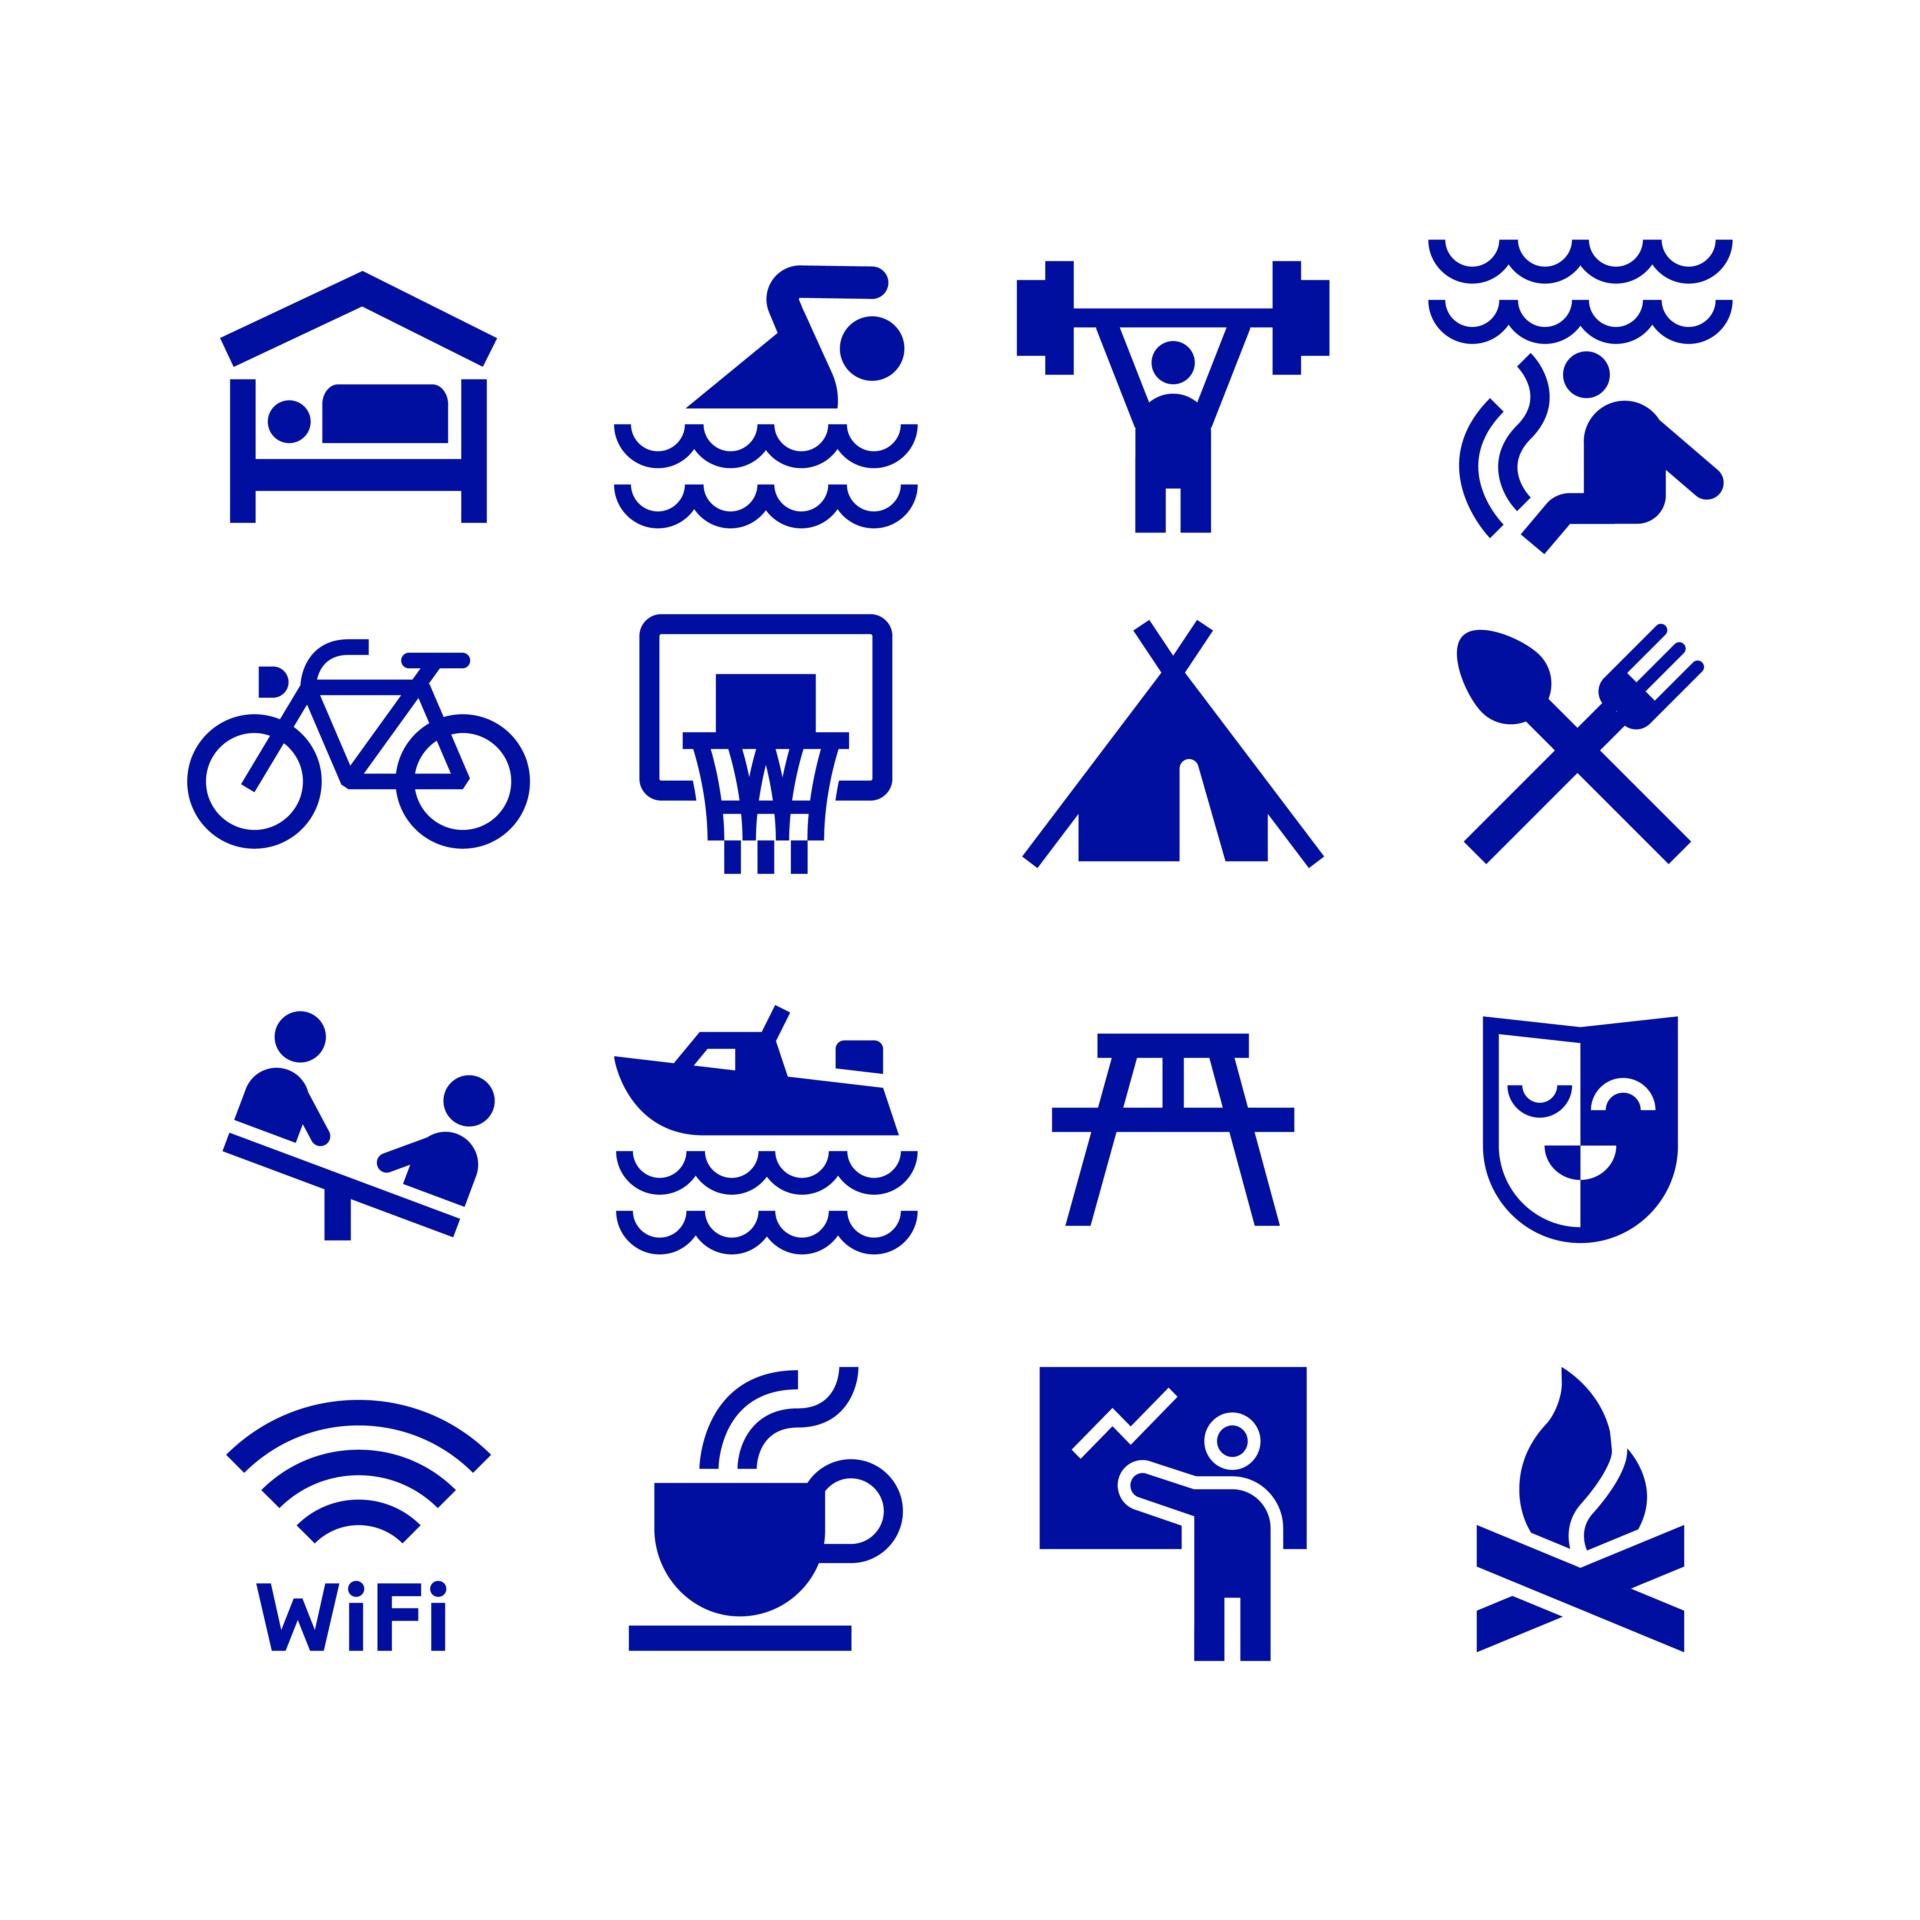 Varska-Piktogrammid